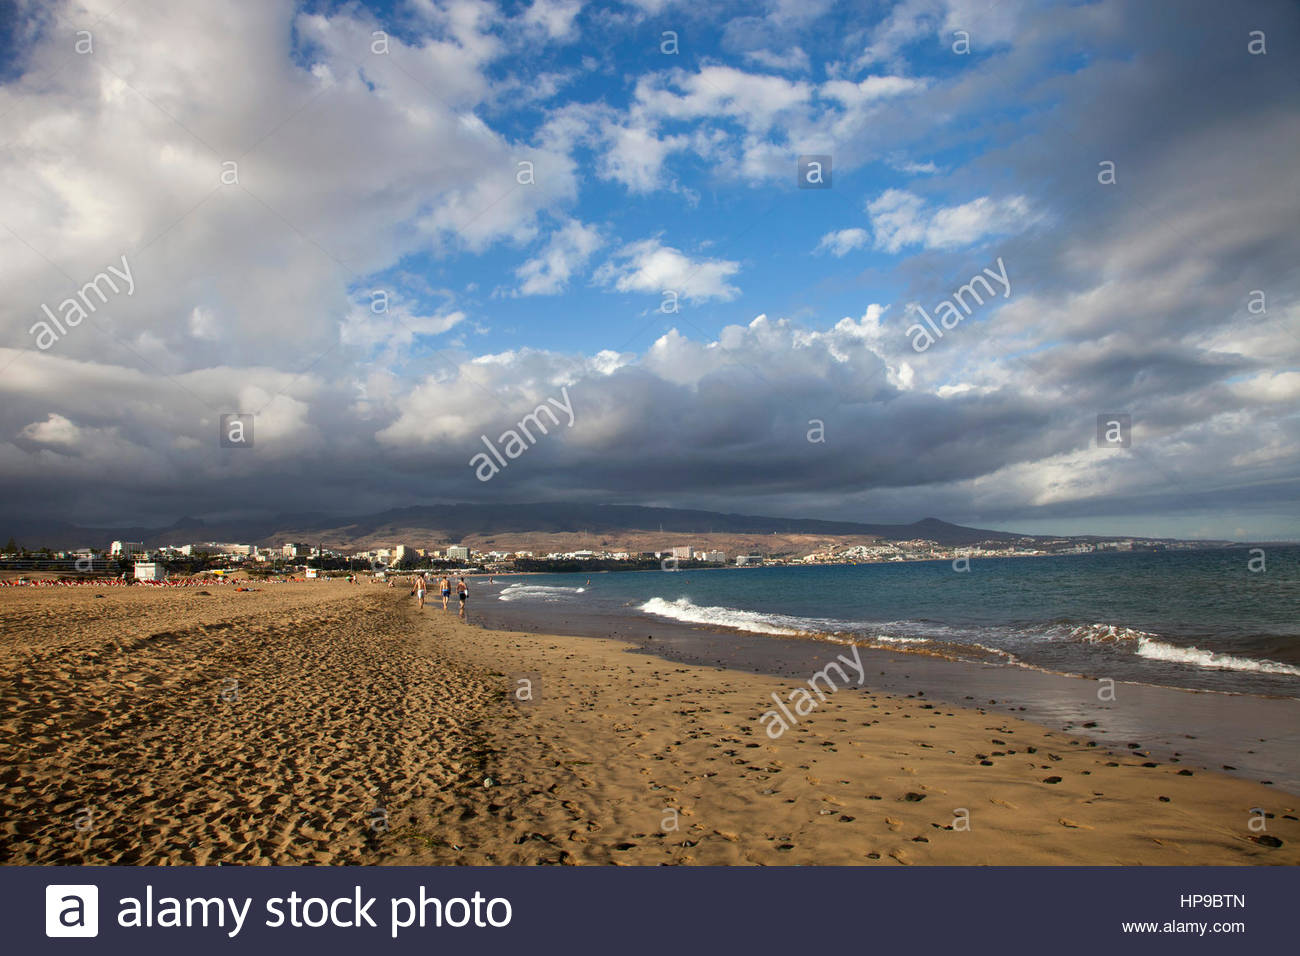 Playa del Ingles, Gran Canaria, Canarie, spagna Stockbild